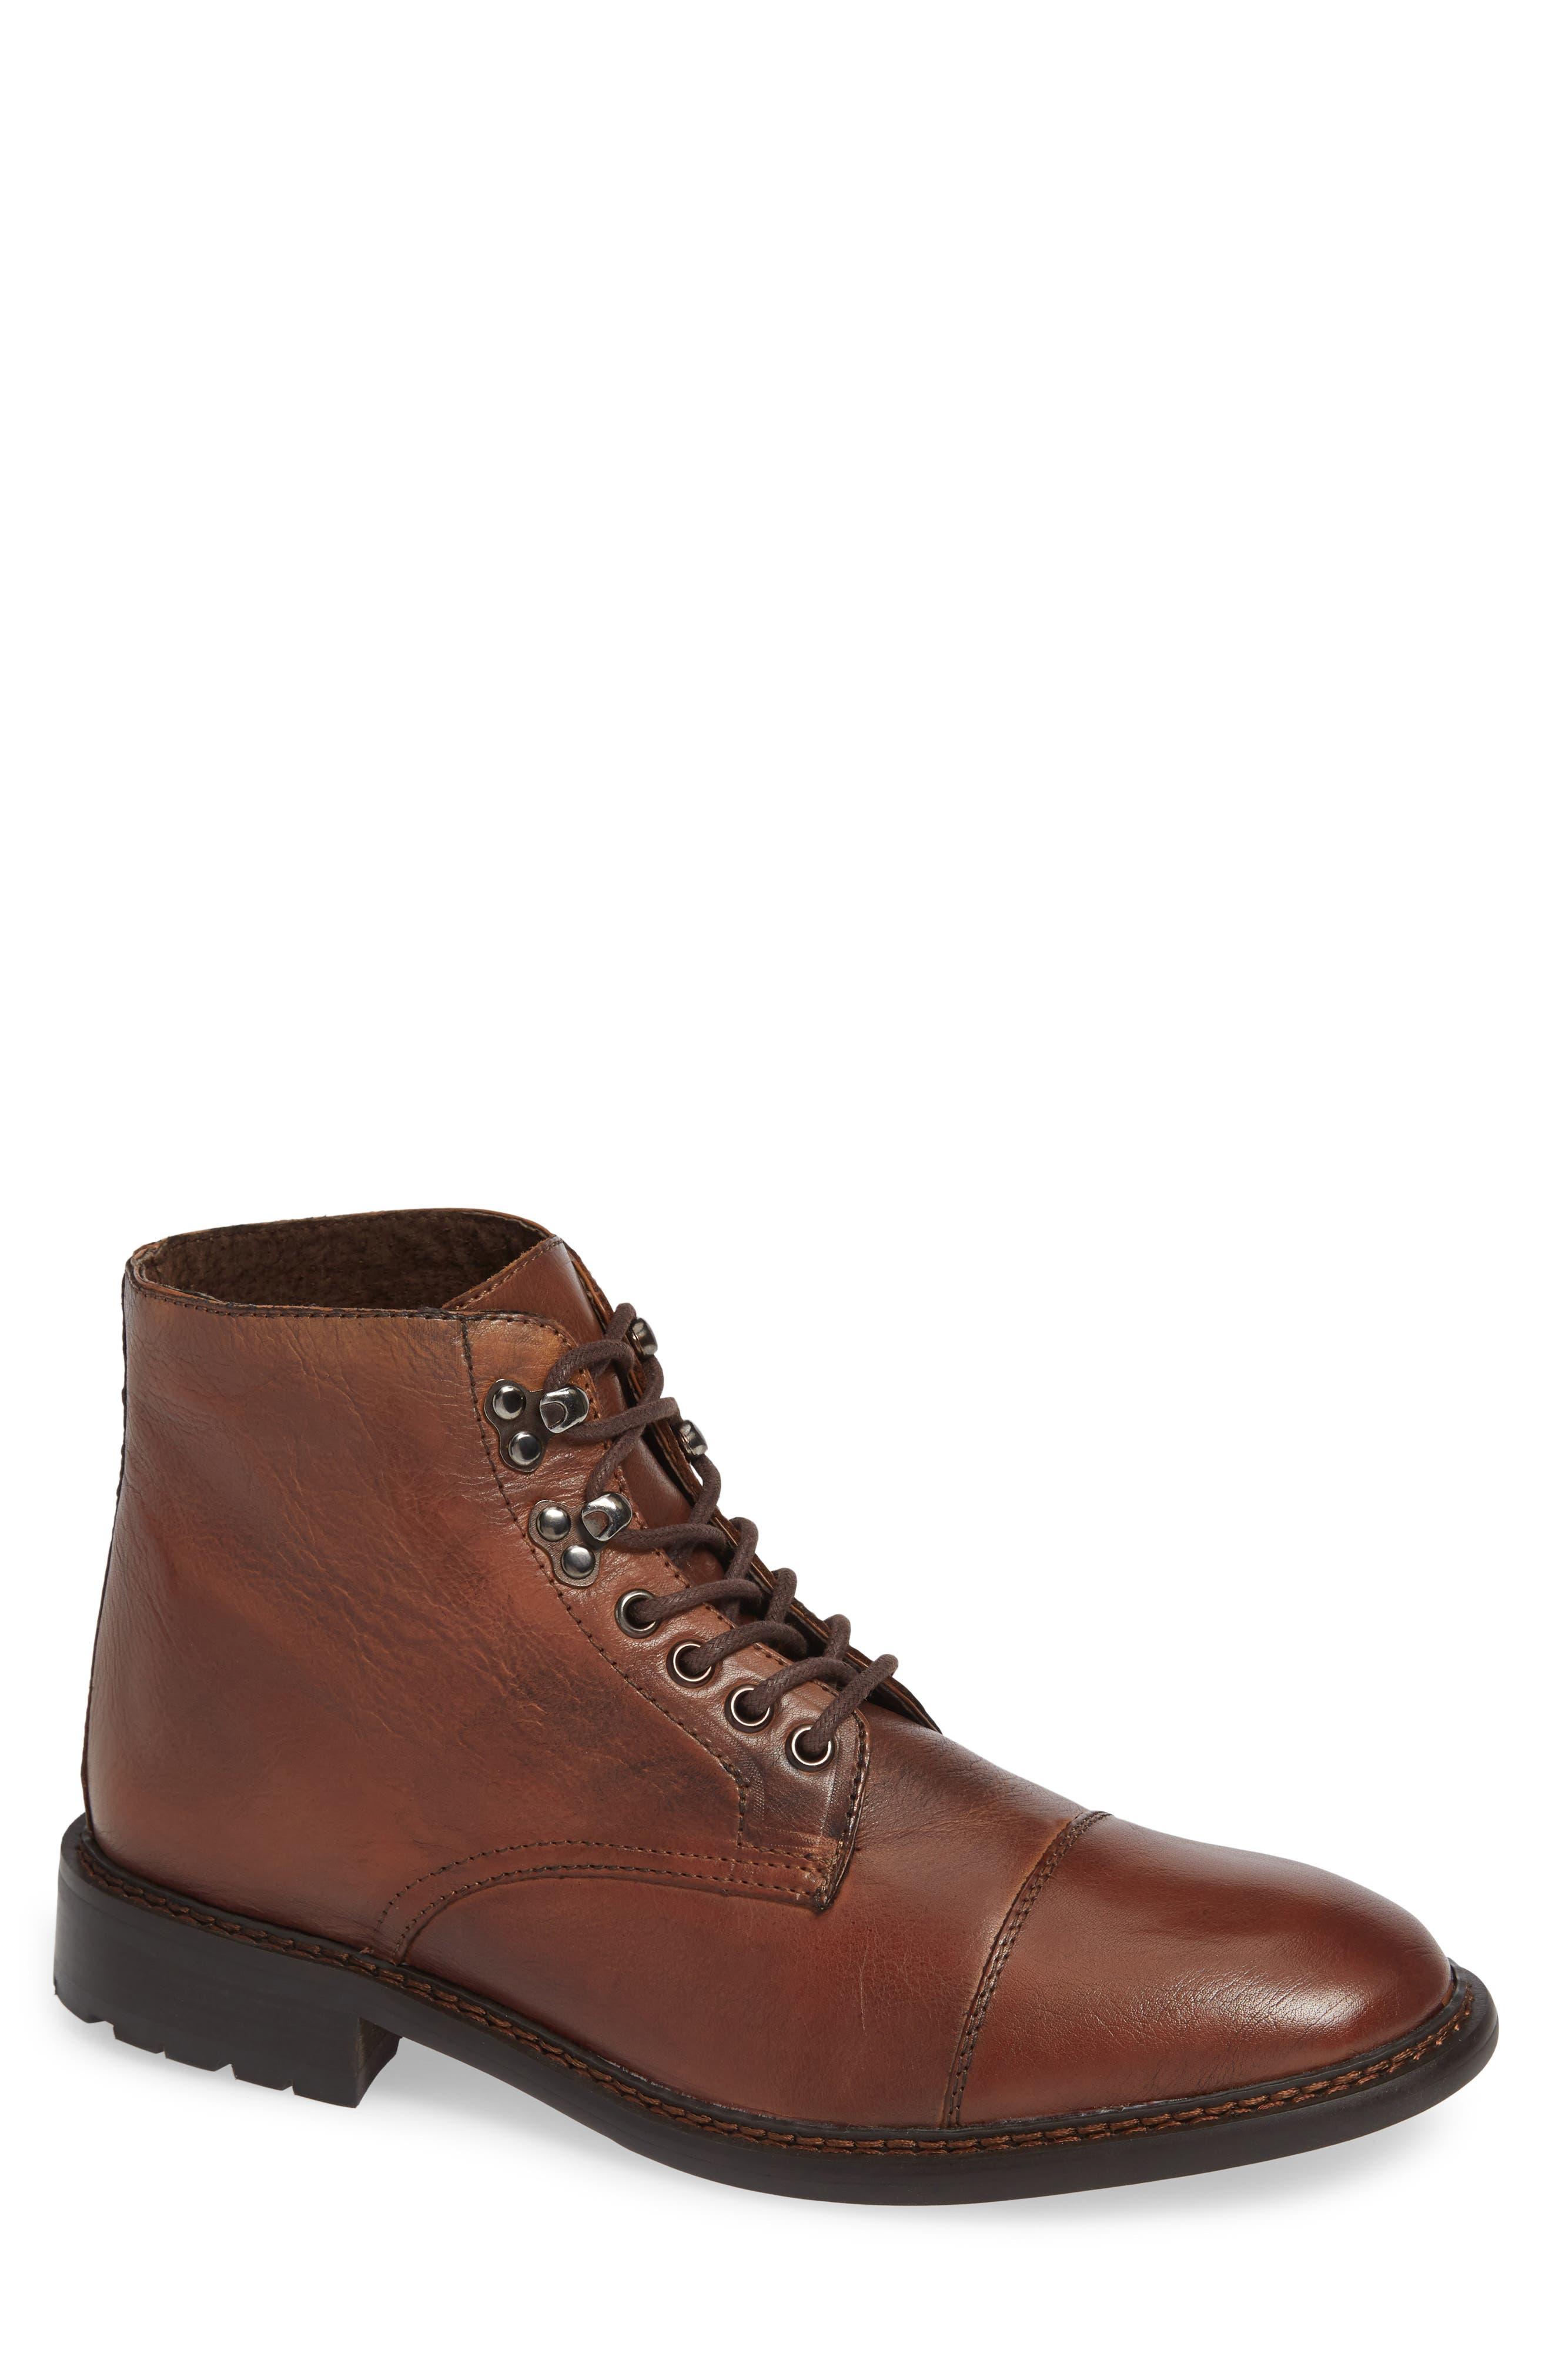 Jump Paxton Cap Toe Boot, Brown